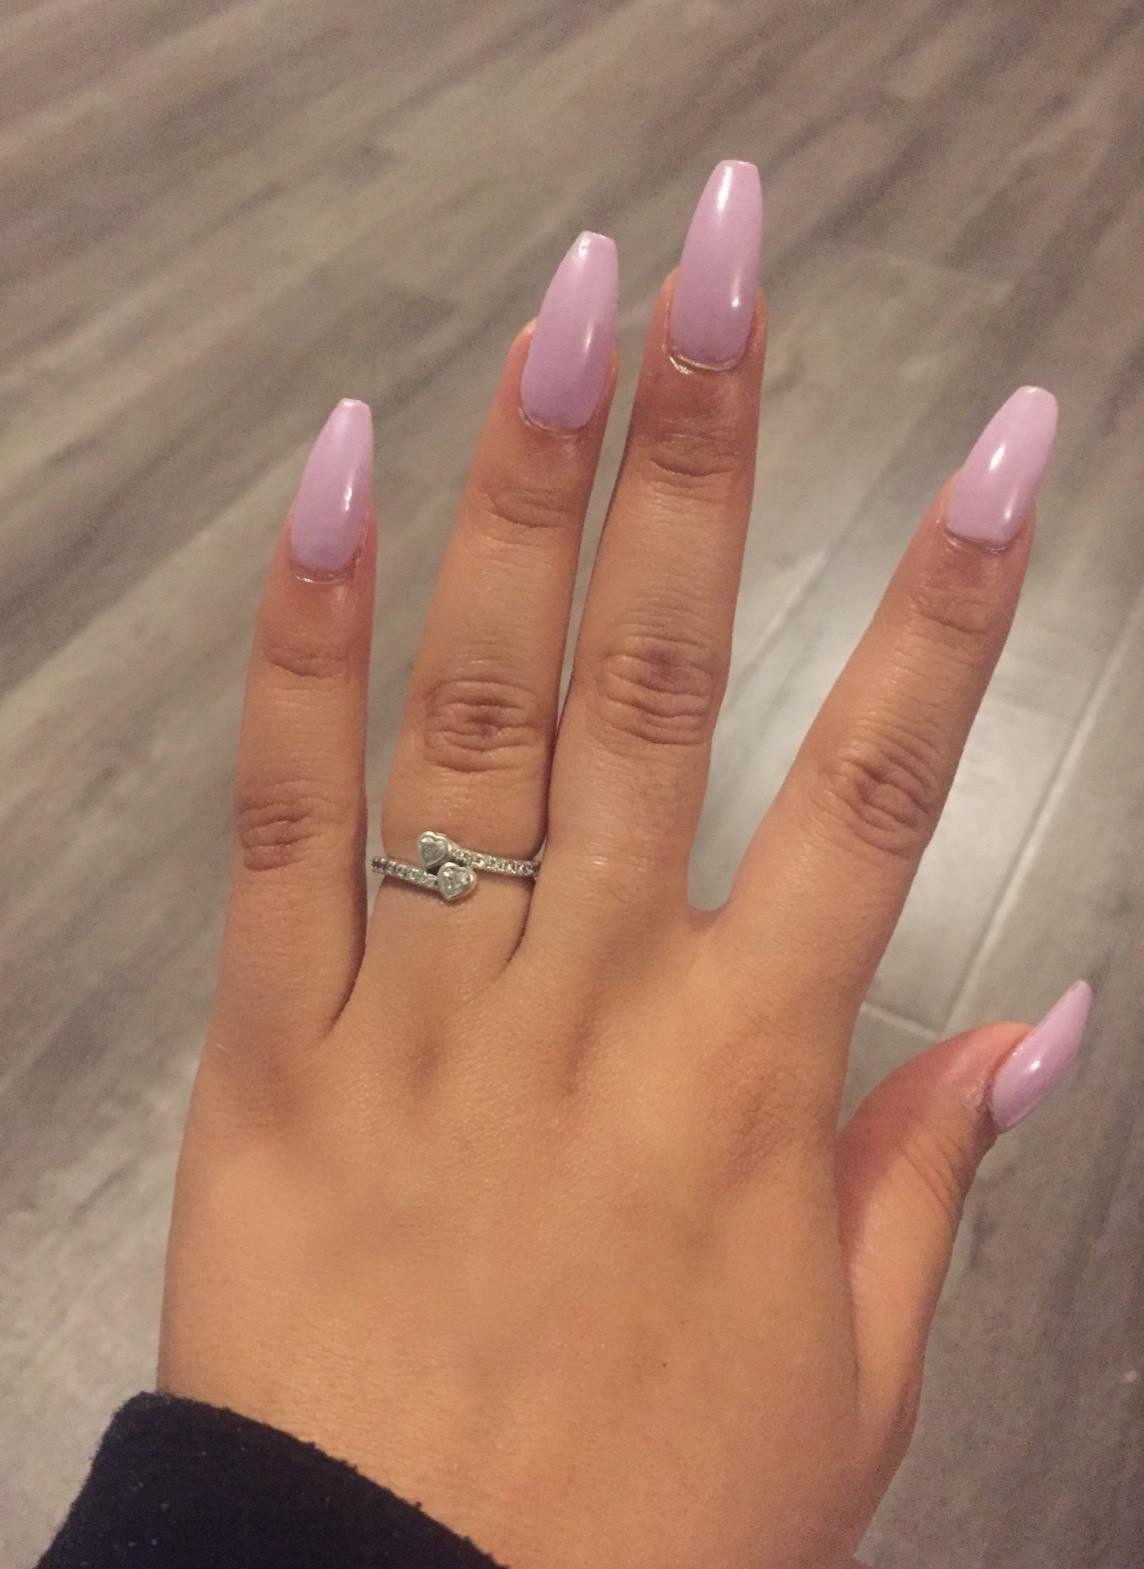 Amazon Com Makartt 500pcs Coffin Nails Clear Ballerina Nail Tips Full Cover Acrylic False Nails 10 Sizes For Nail Salons And Diy Nail Art Beauty Acryl